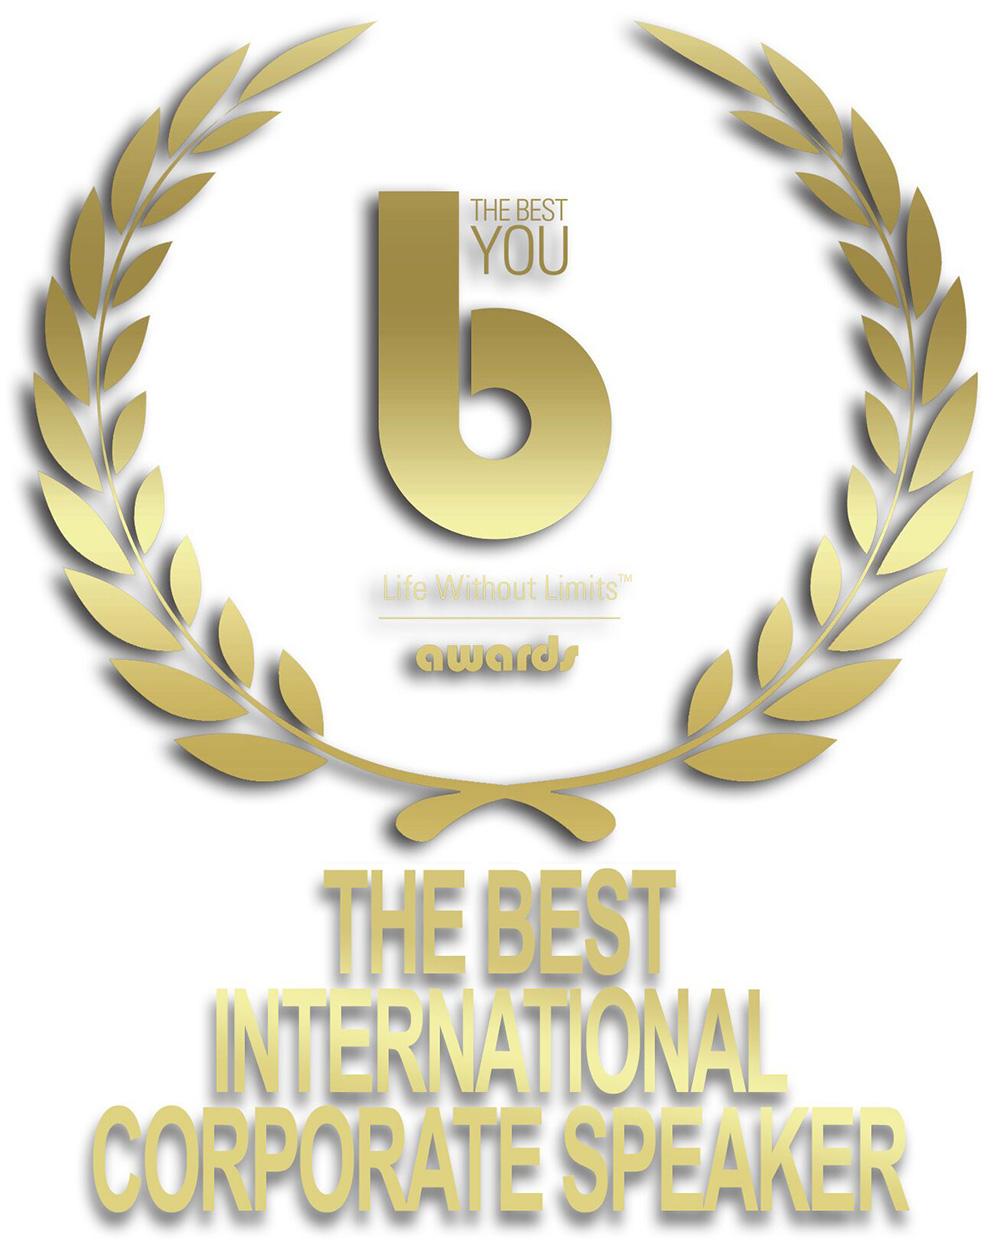 Logo for The Best International Corporate Speaker award at The Best You awards